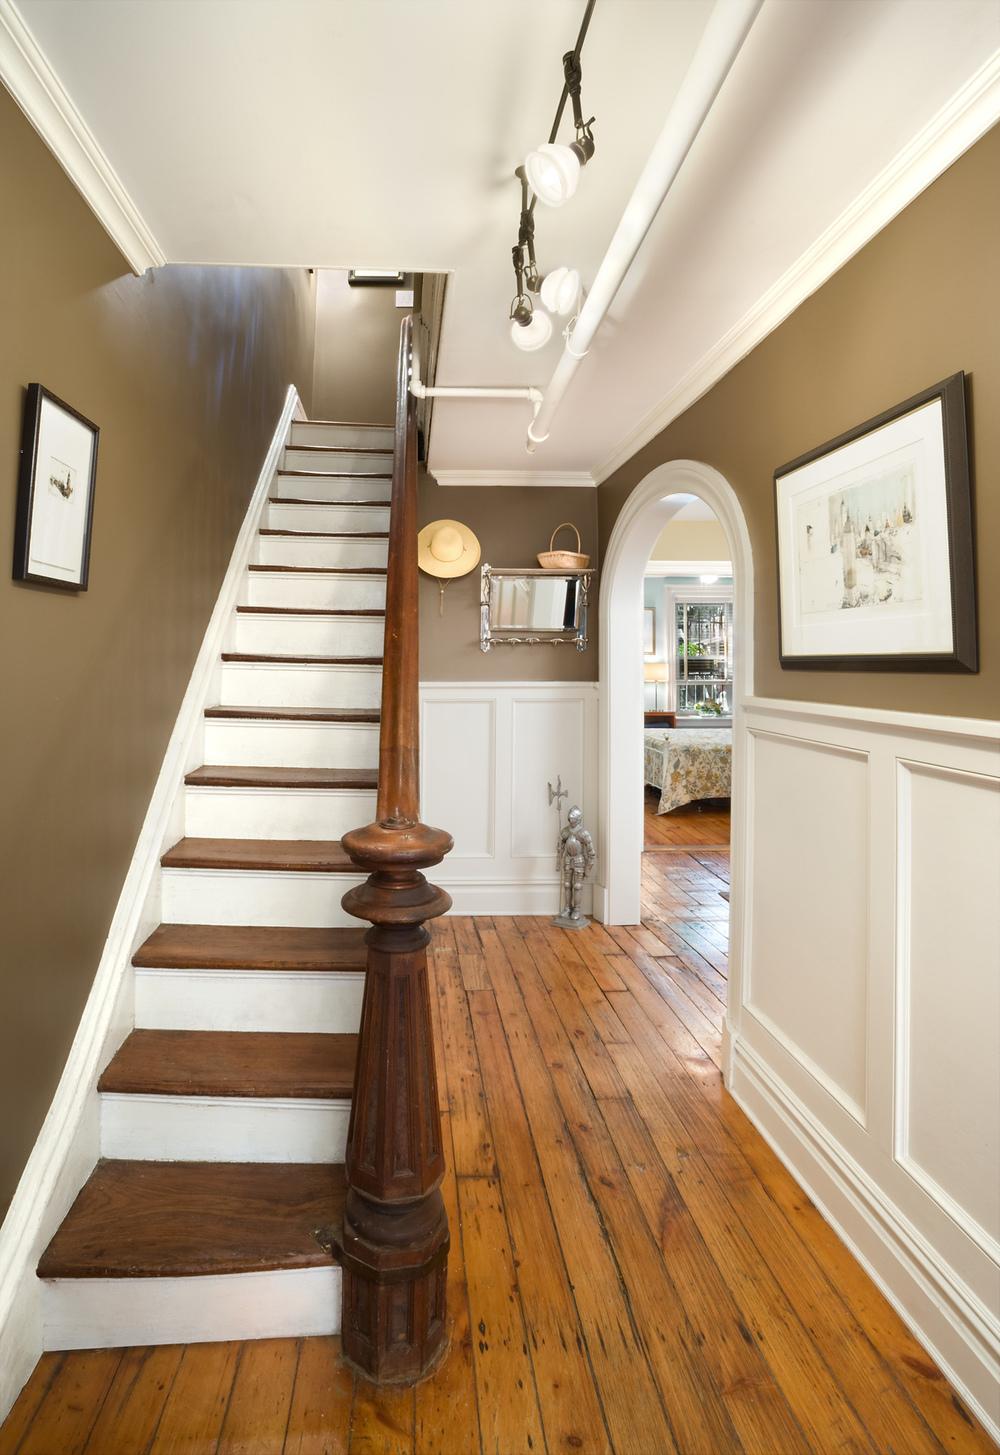 Historic Brownstone Residence. Tobin Parnes Design. Brooklyn, NY. Residential. Hallway. Stair.